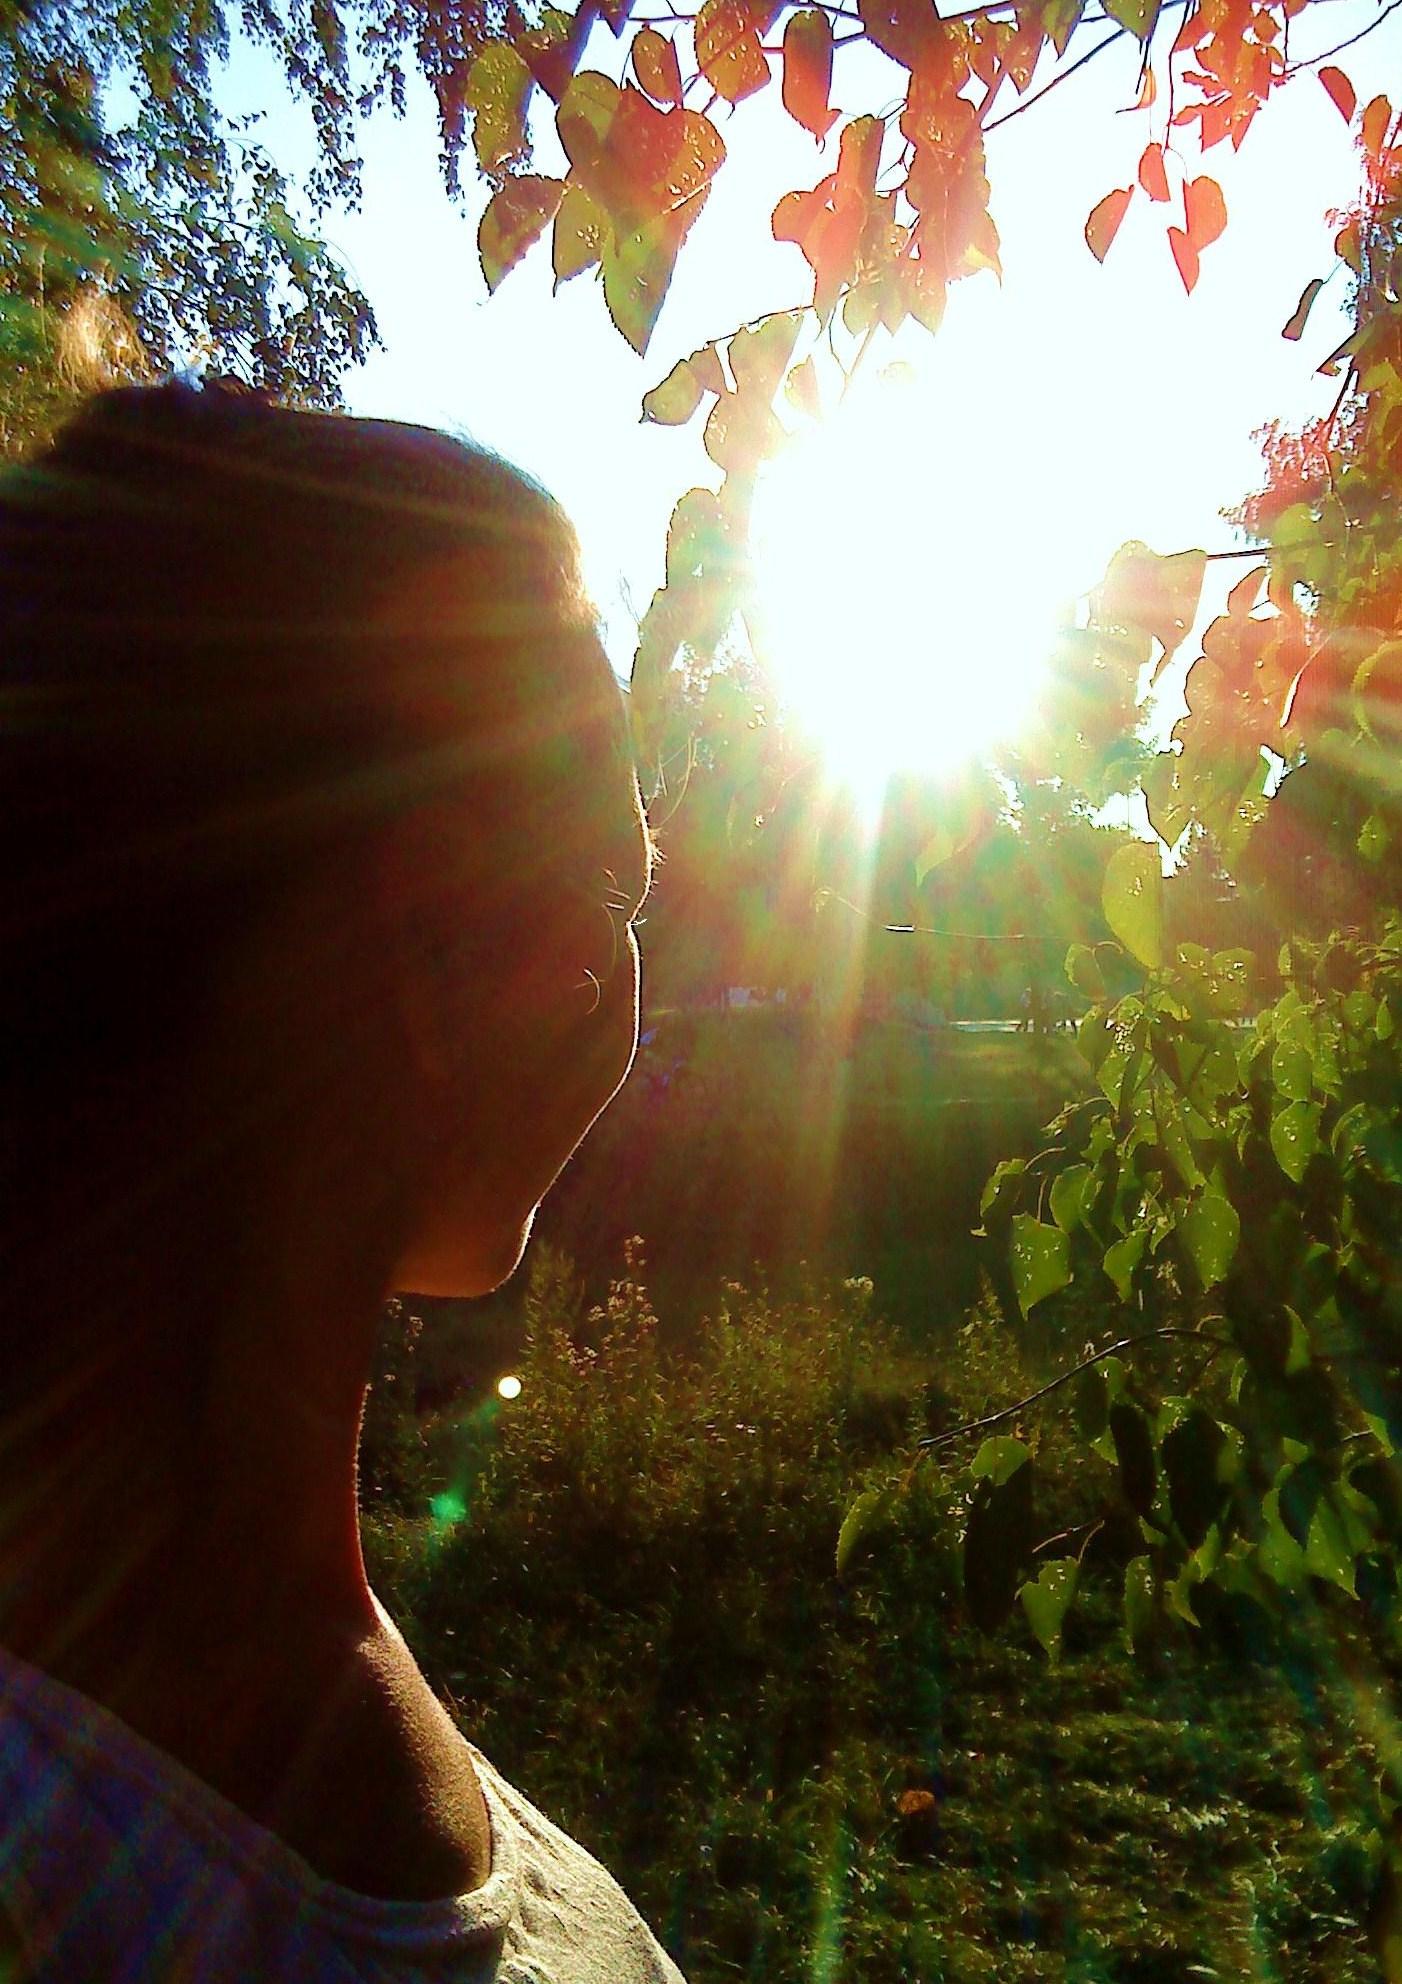 Осеннее солнце. Осенний образ